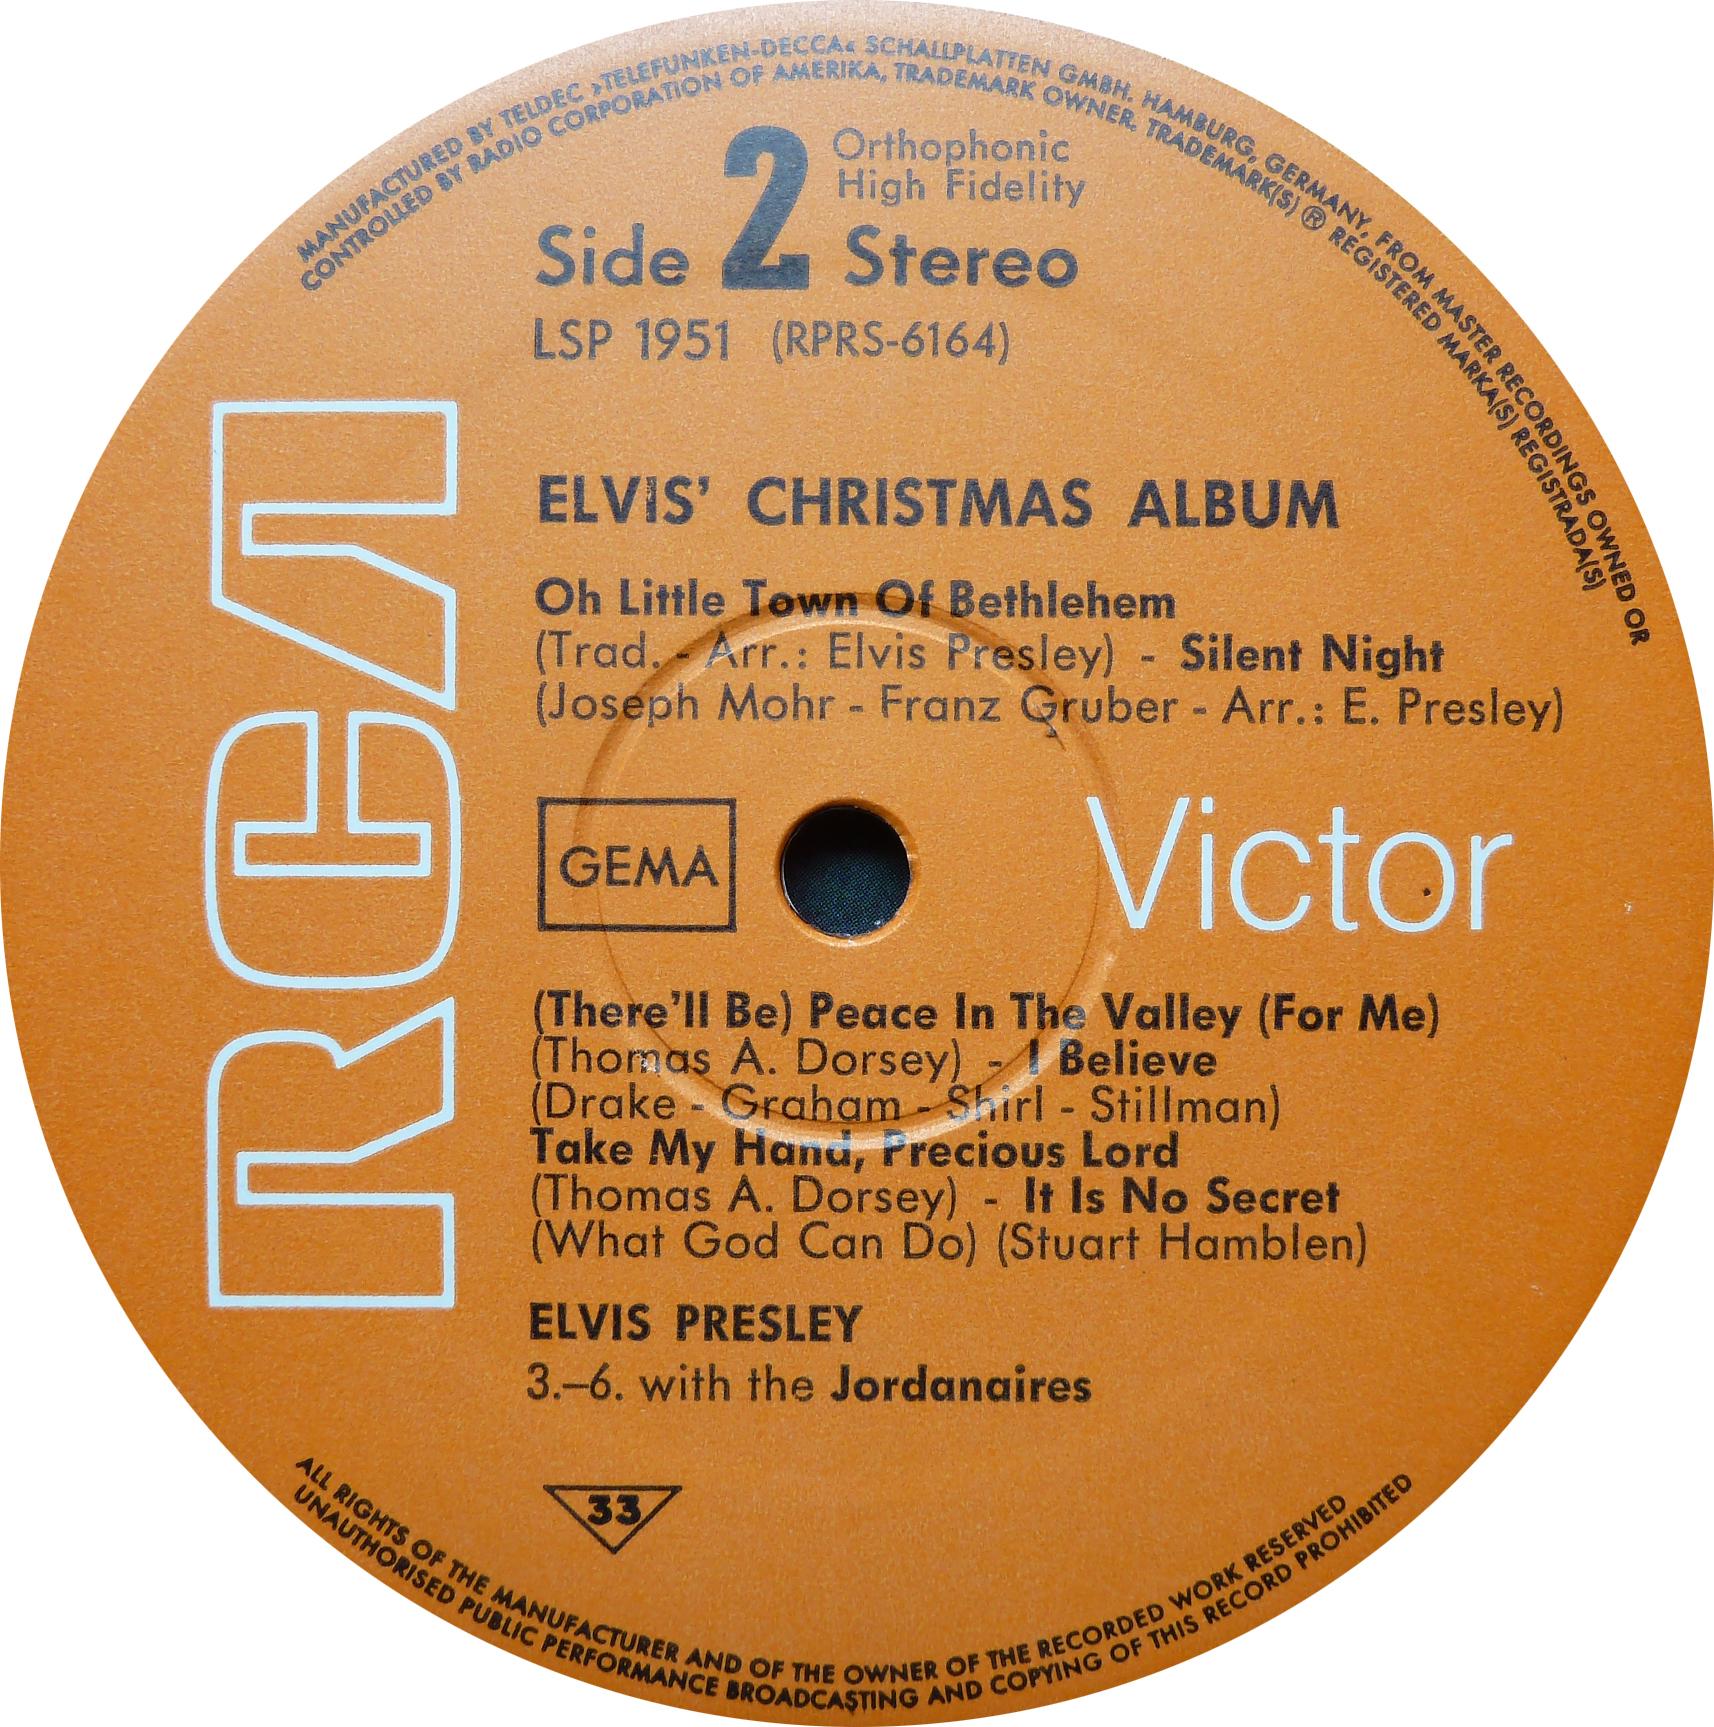 ELVIS' CHRISTMAS ALBUM (1964) Christmasalbum1968siddsuob